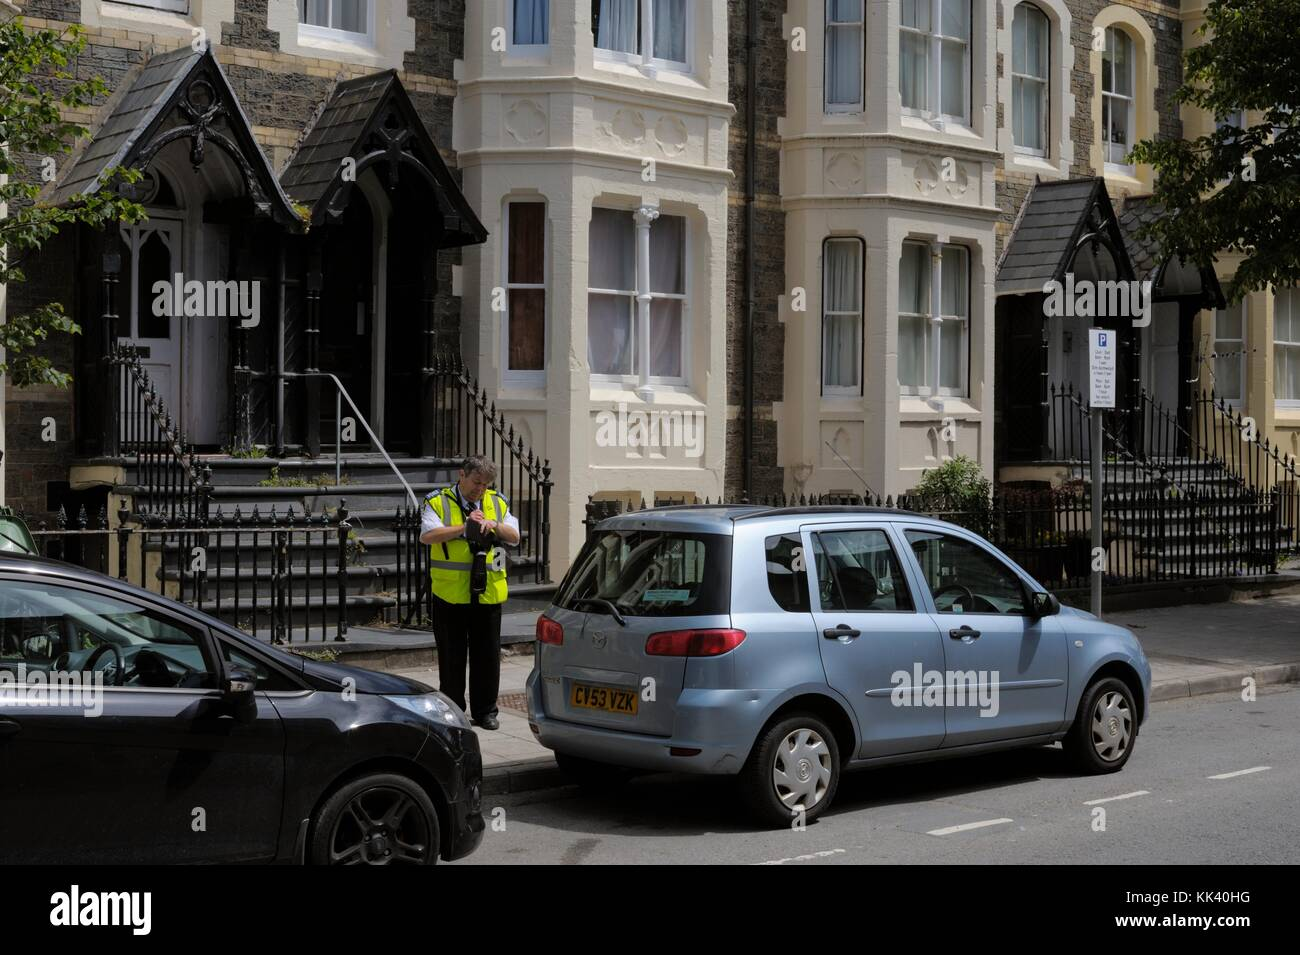 Traffic warden recording parking violation, Aberystwyth, Wales, UK - Stock Image